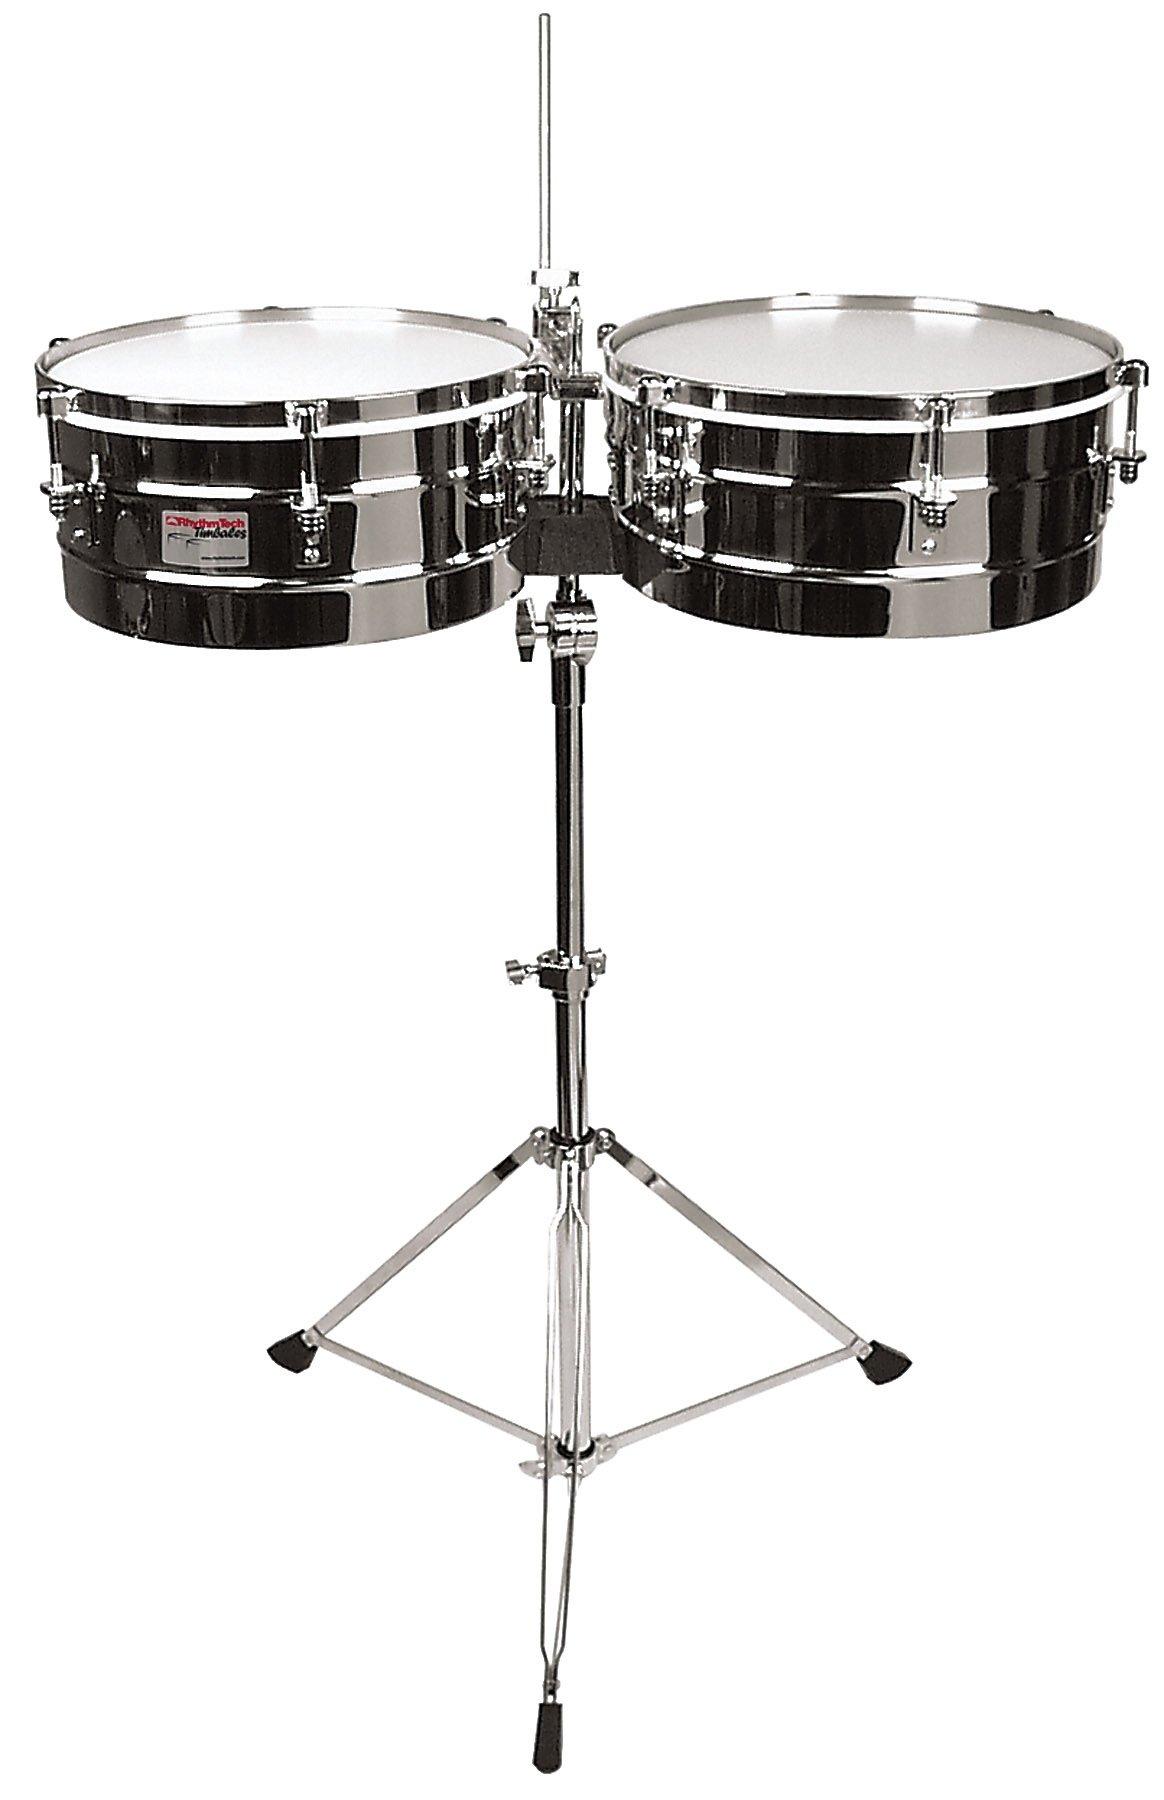 Rhythm Tech RT 5345 Timbales-Chrome w/Stand by Rhythm Tech